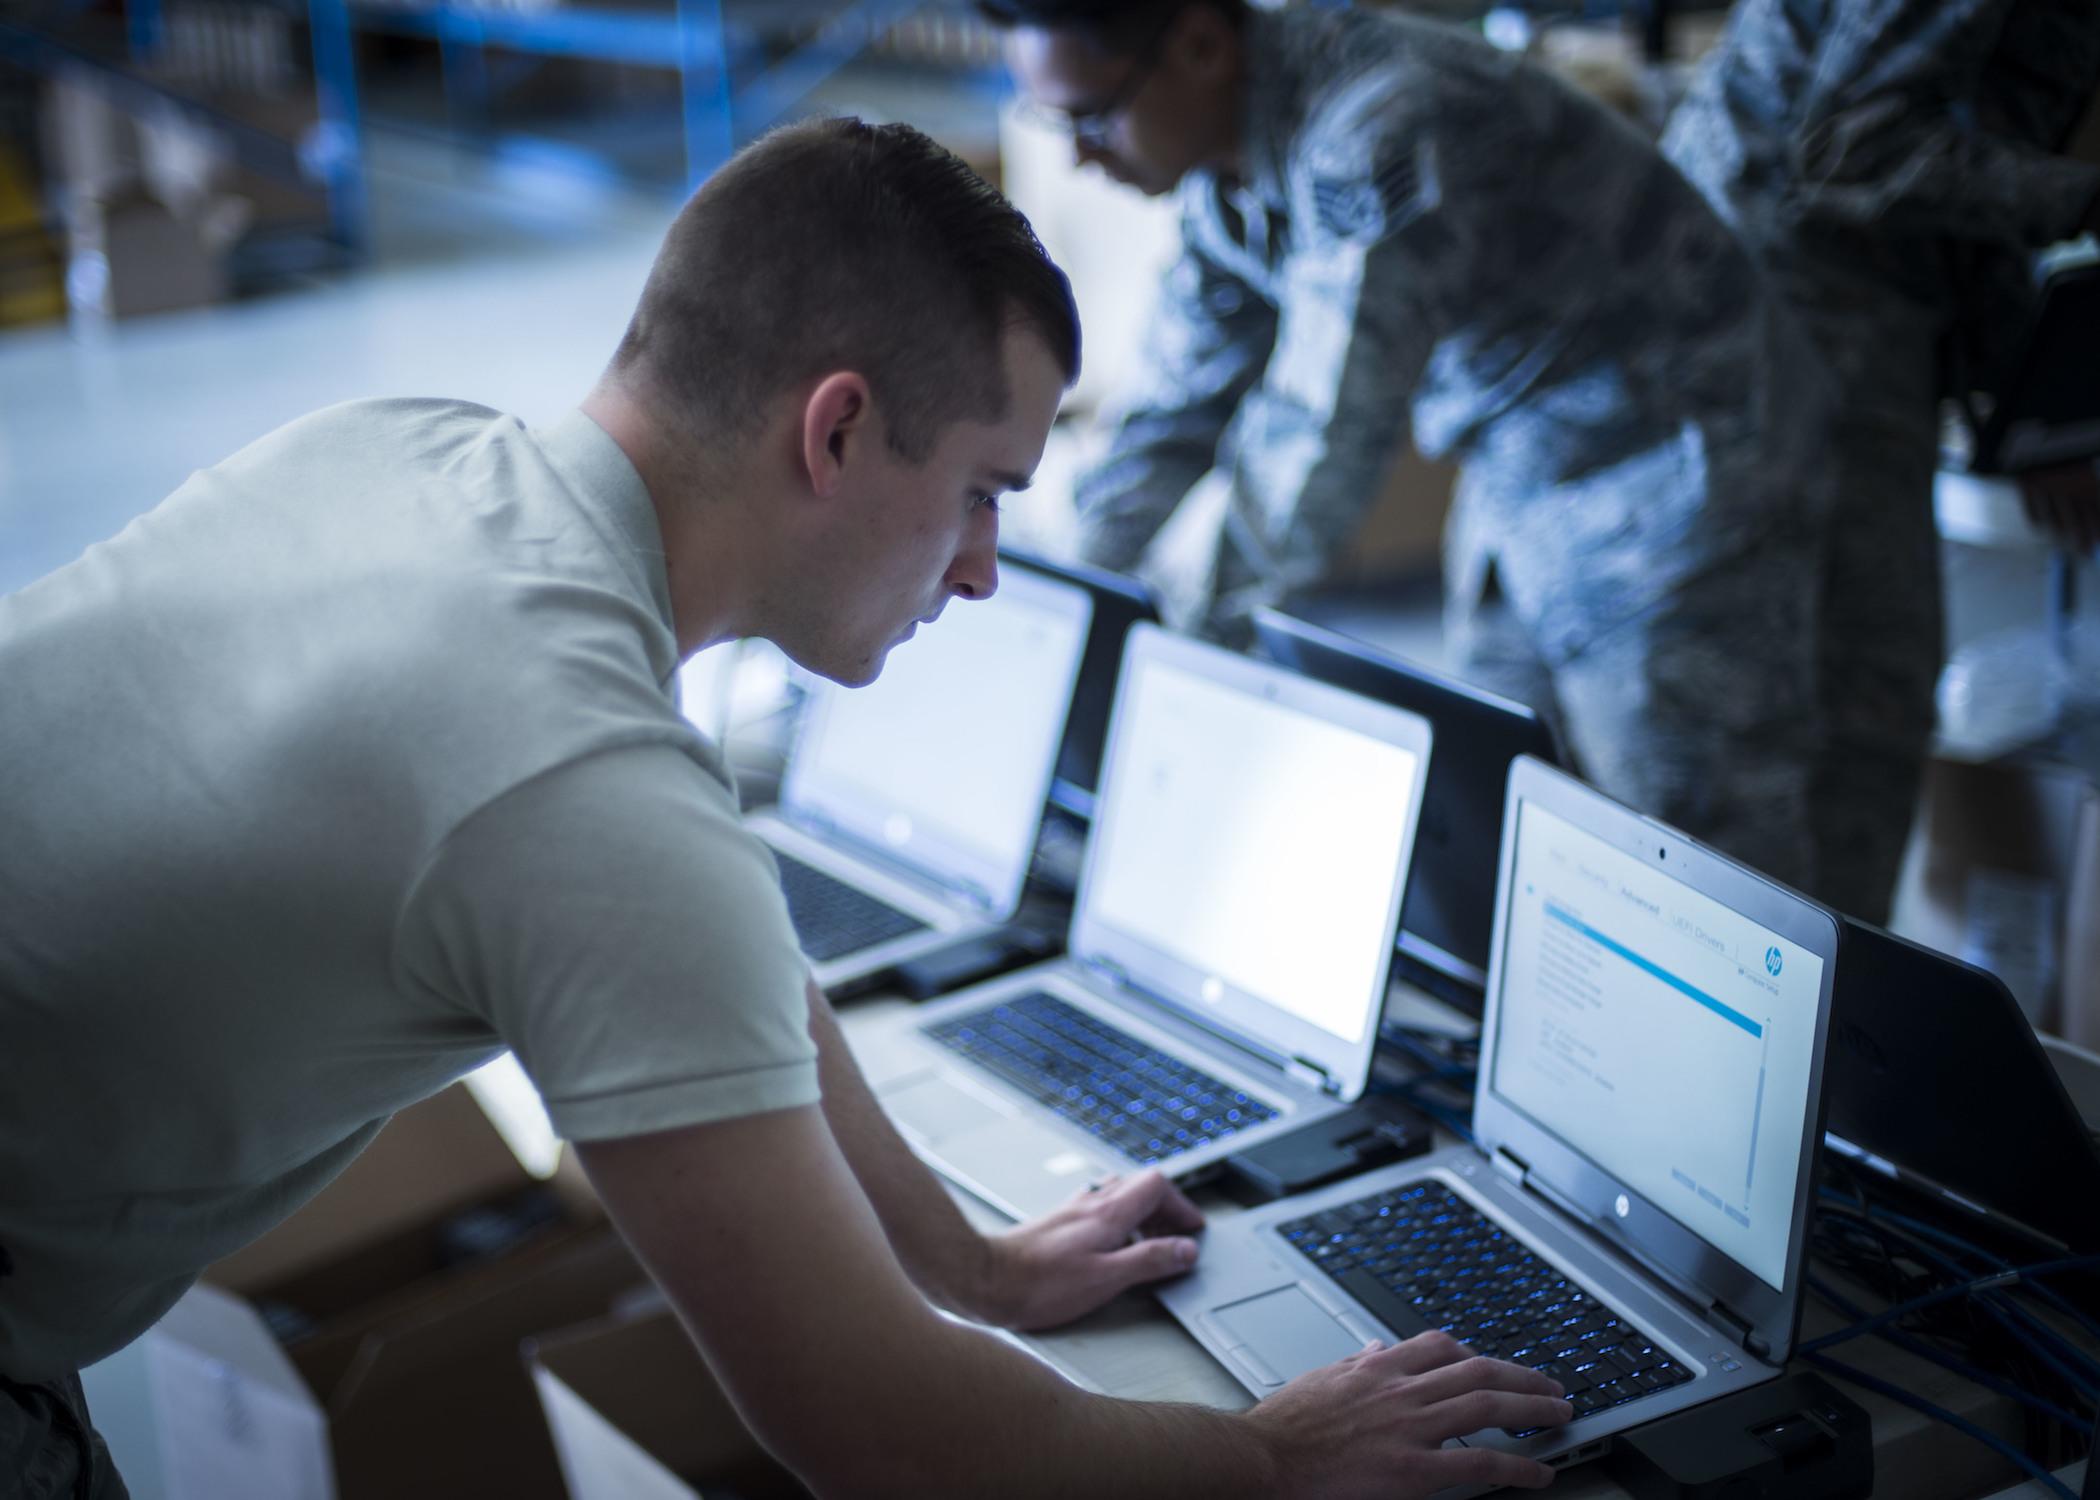 DOD's Defense Enterprise Office Solution